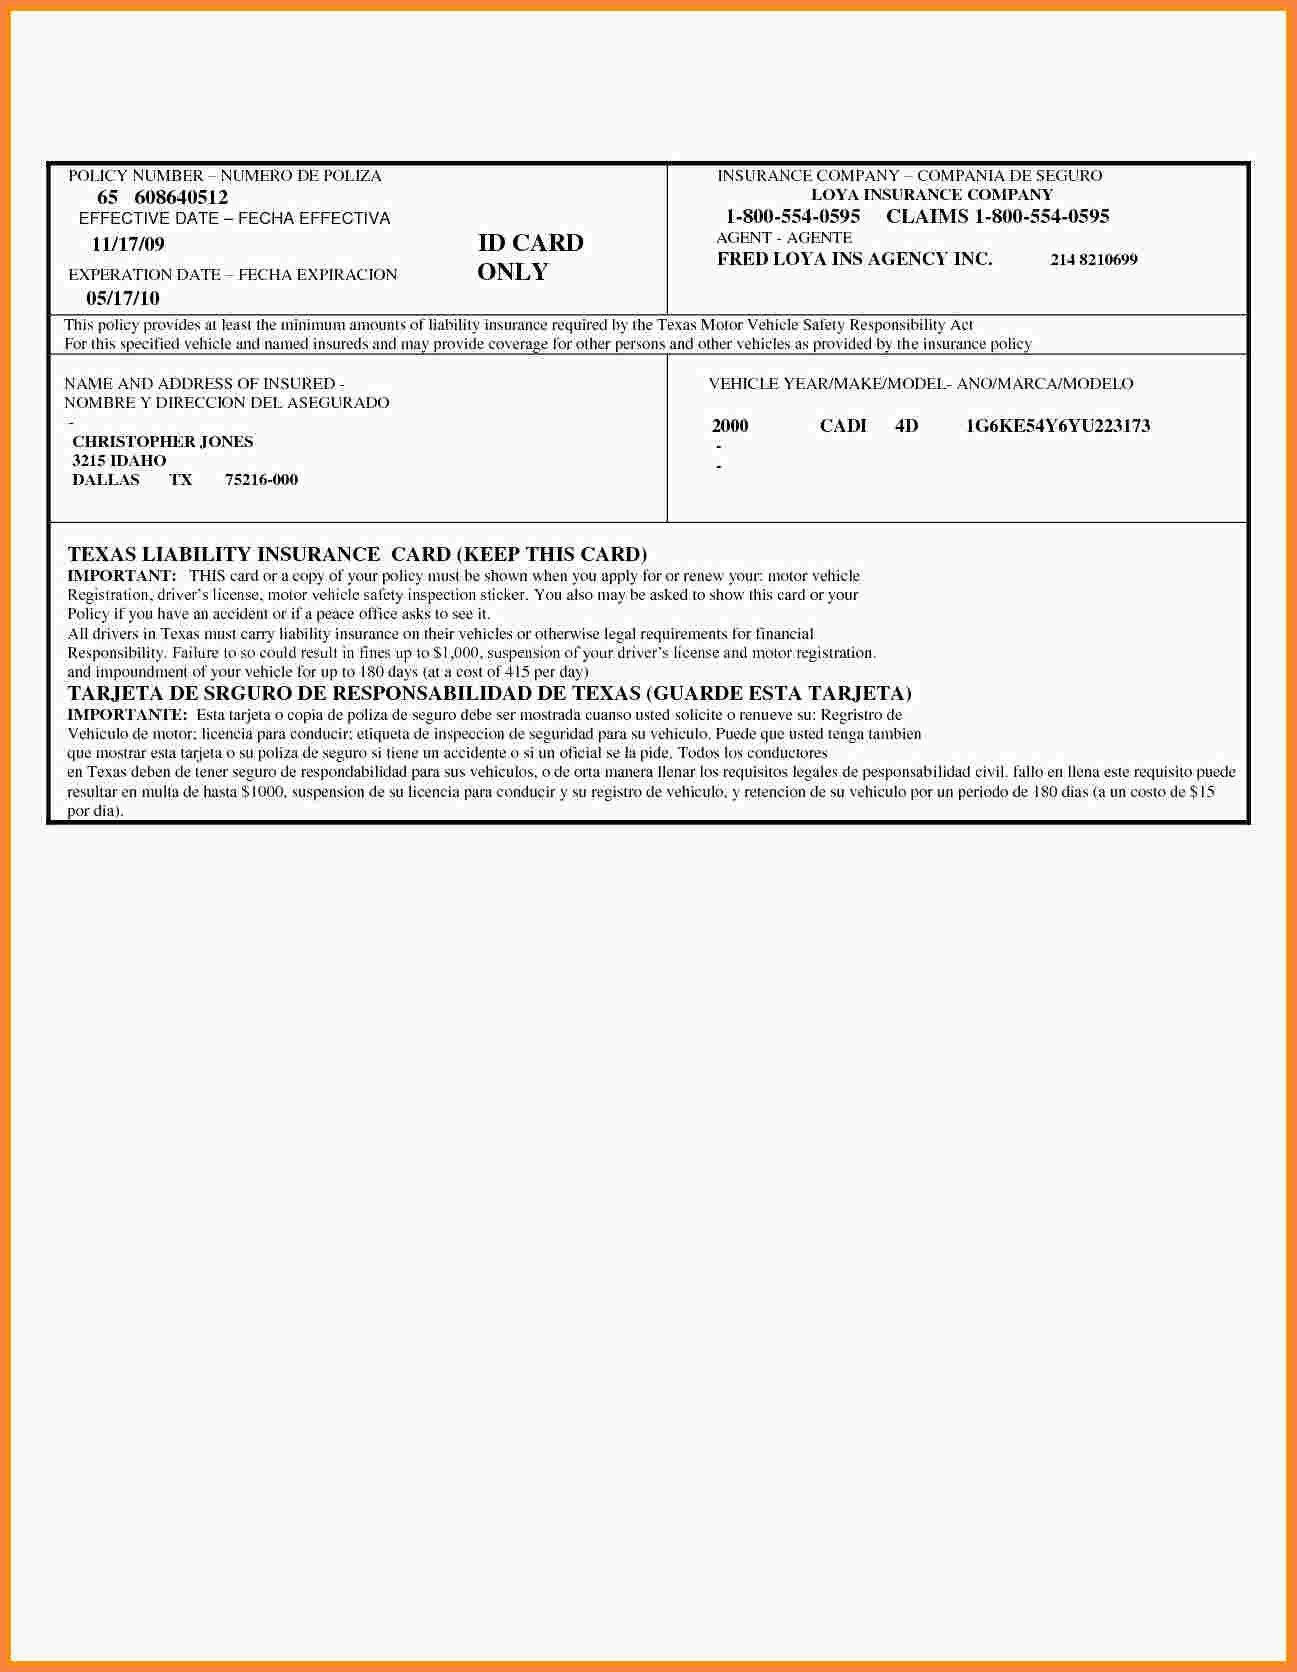 Free Fake Auto Insurance Card Template  Proposal Letter Throughout Free Fake Auto Insurance Card Template